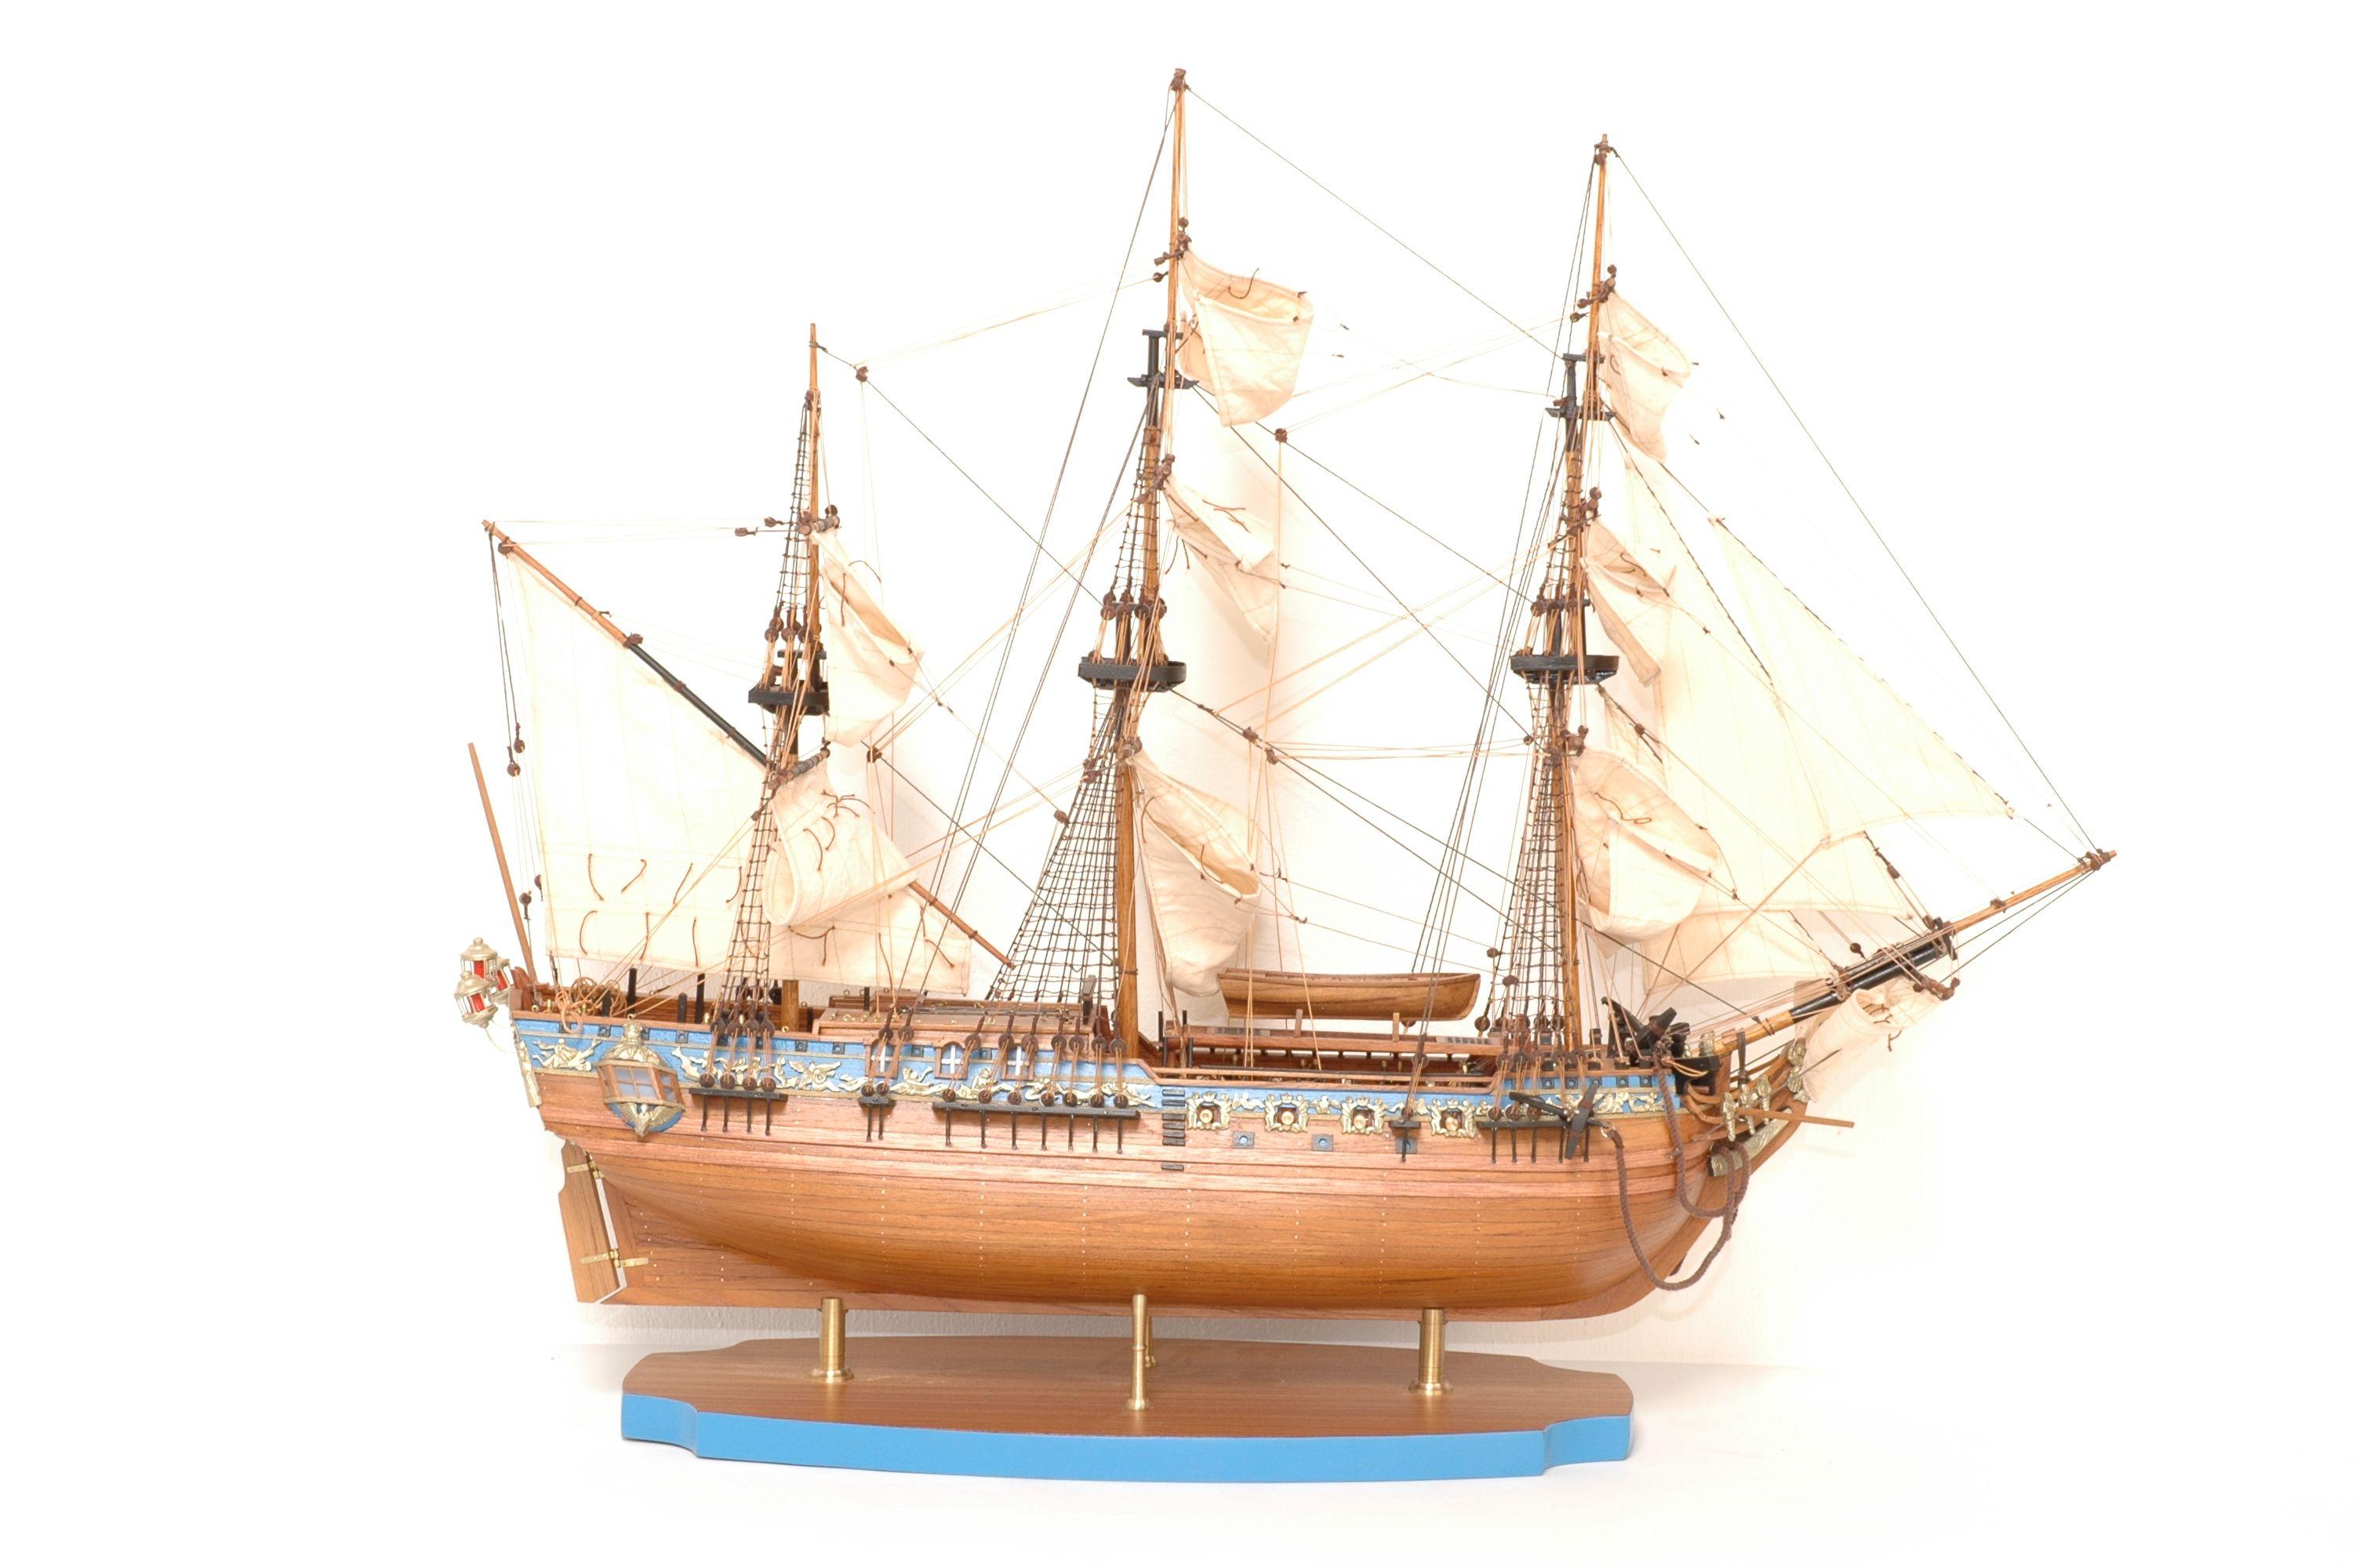 149-8199-Royal-Caroline-Ship-Model-Superior-Range